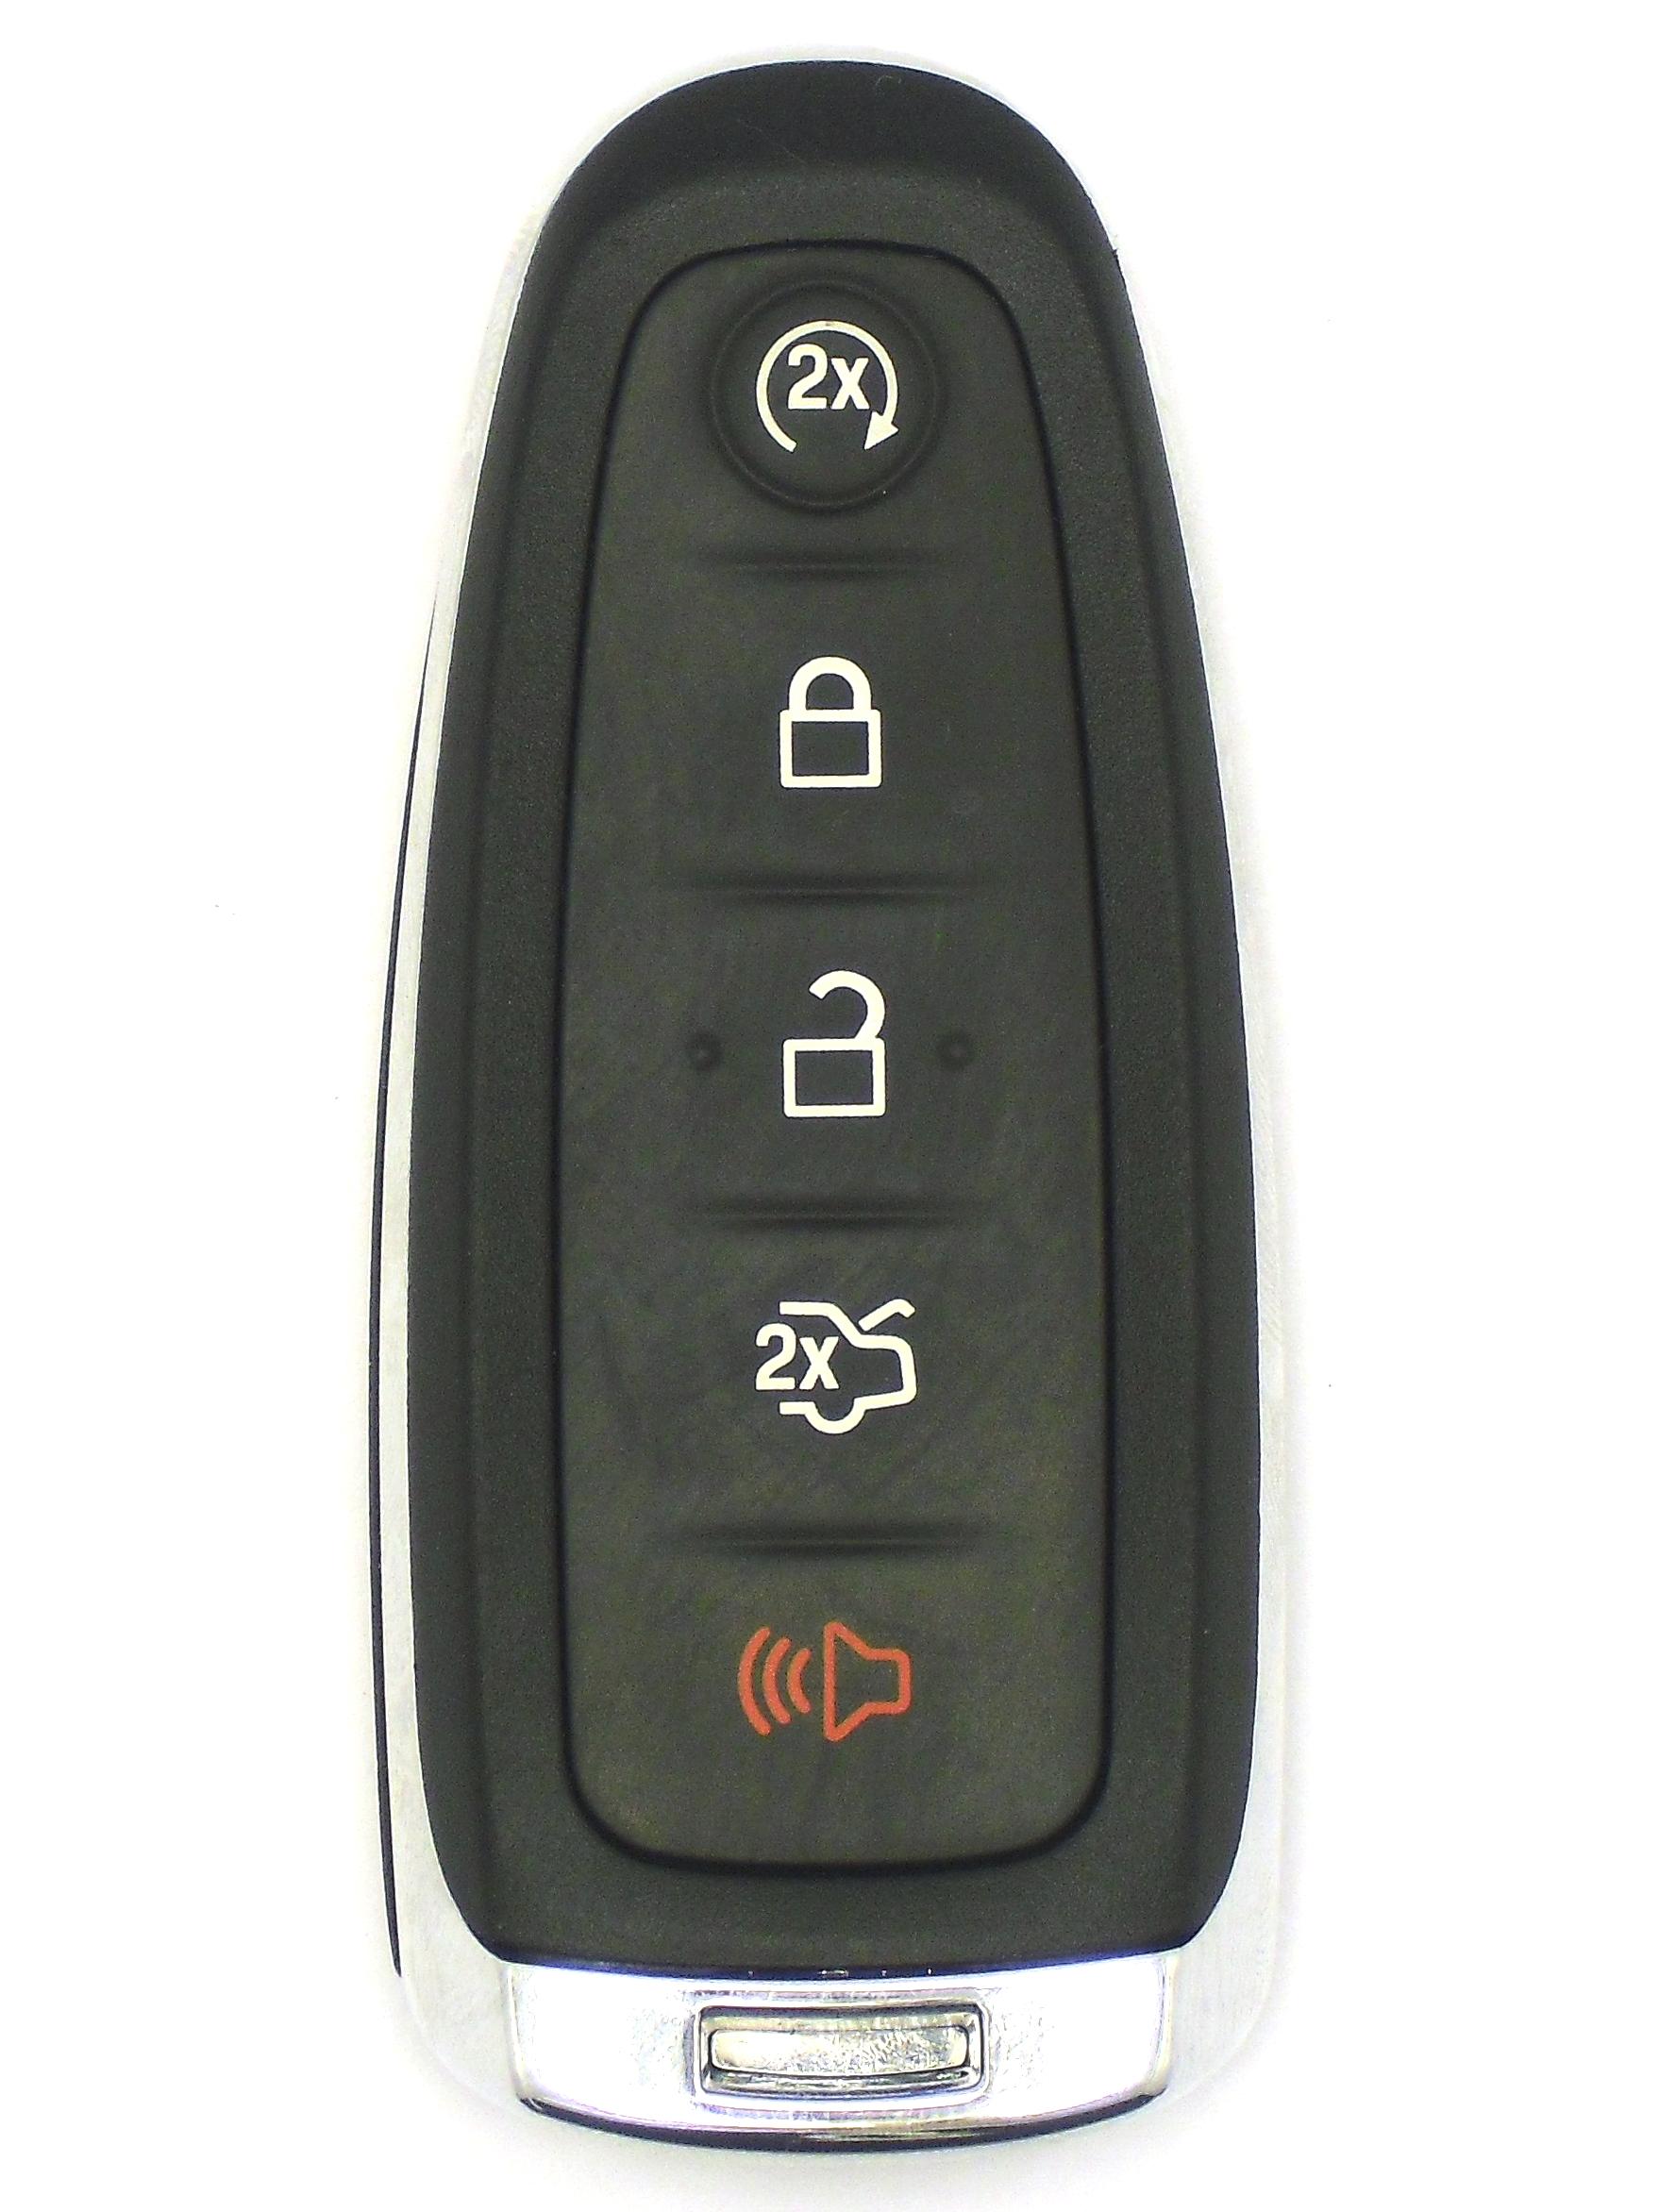 lincoln remote entry smart key 5 button w remote start. Black Bedroom Furniture Sets. Home Design Ideas